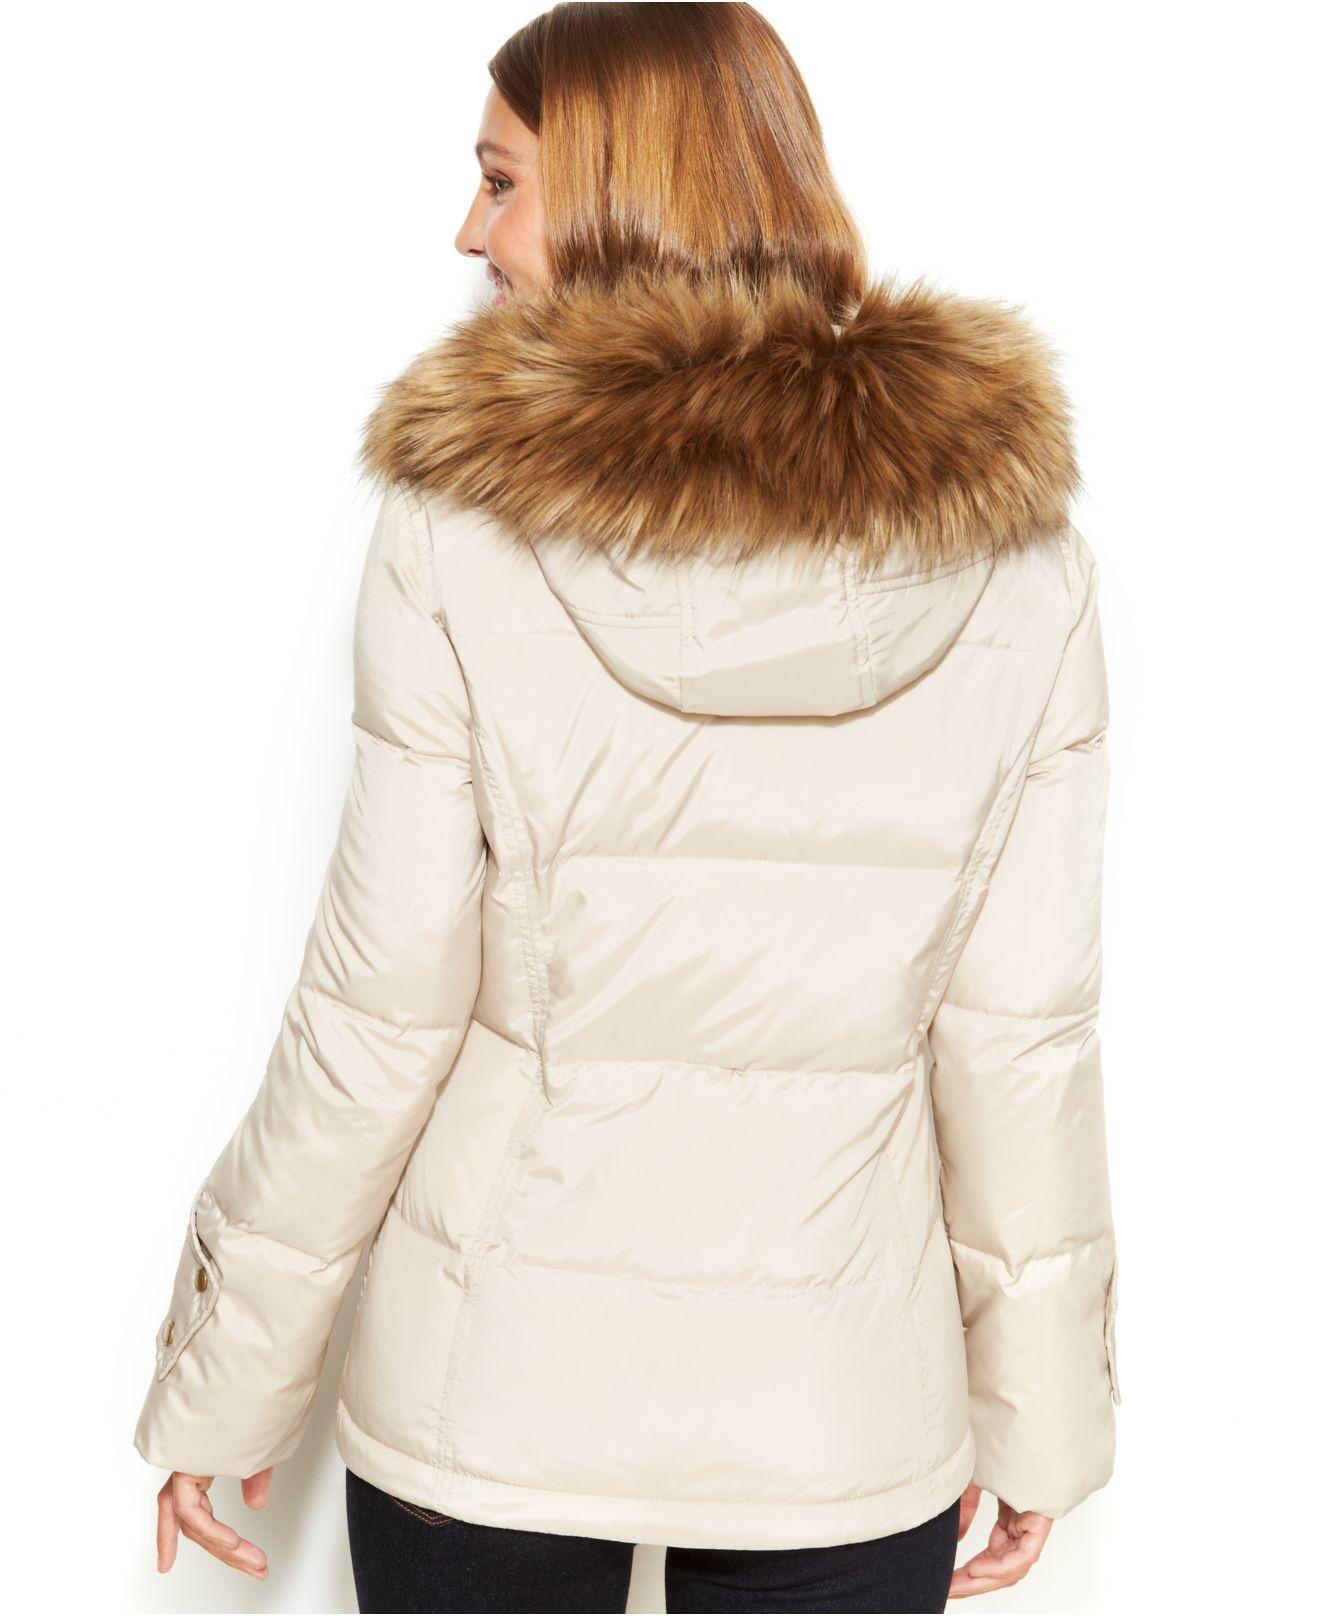 02e68547274e Lyst - Calvin Klein Petite Faux-Fur-Trim Hooded Down Jacket in Blue